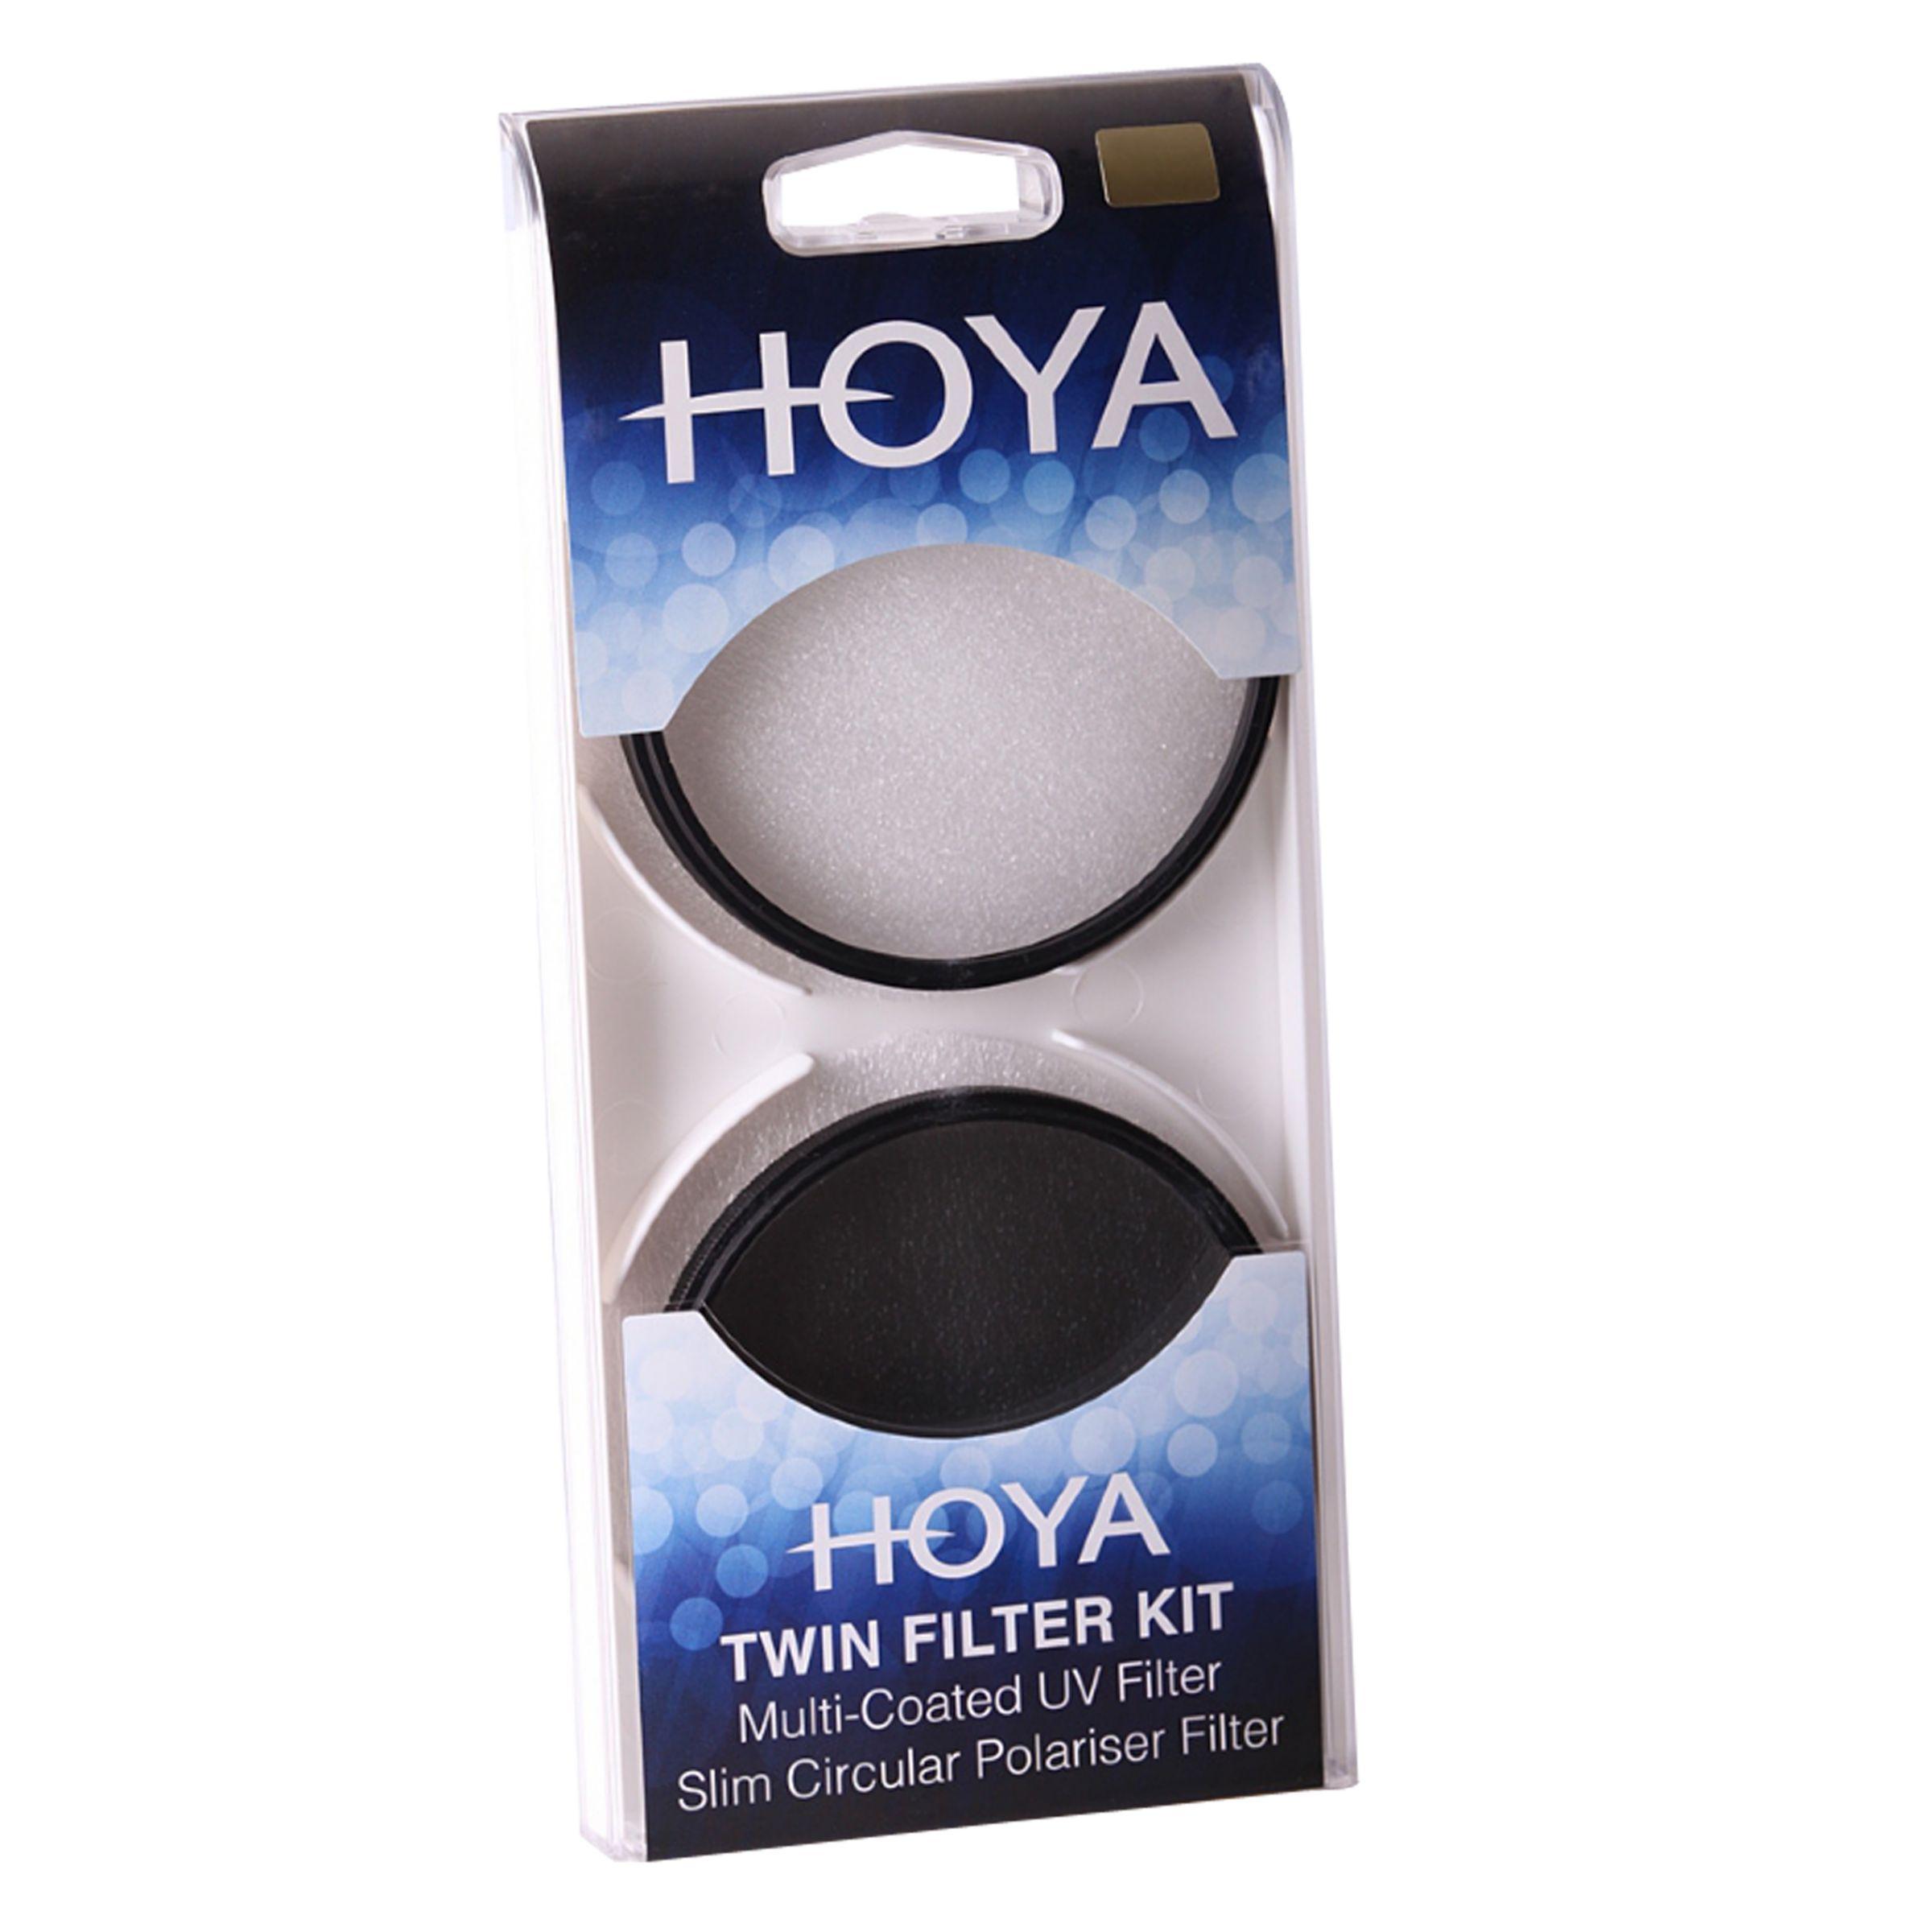 Hoya Hoya 67mm Twin Lens Filter Pack With UV & Circular Polariser Filter